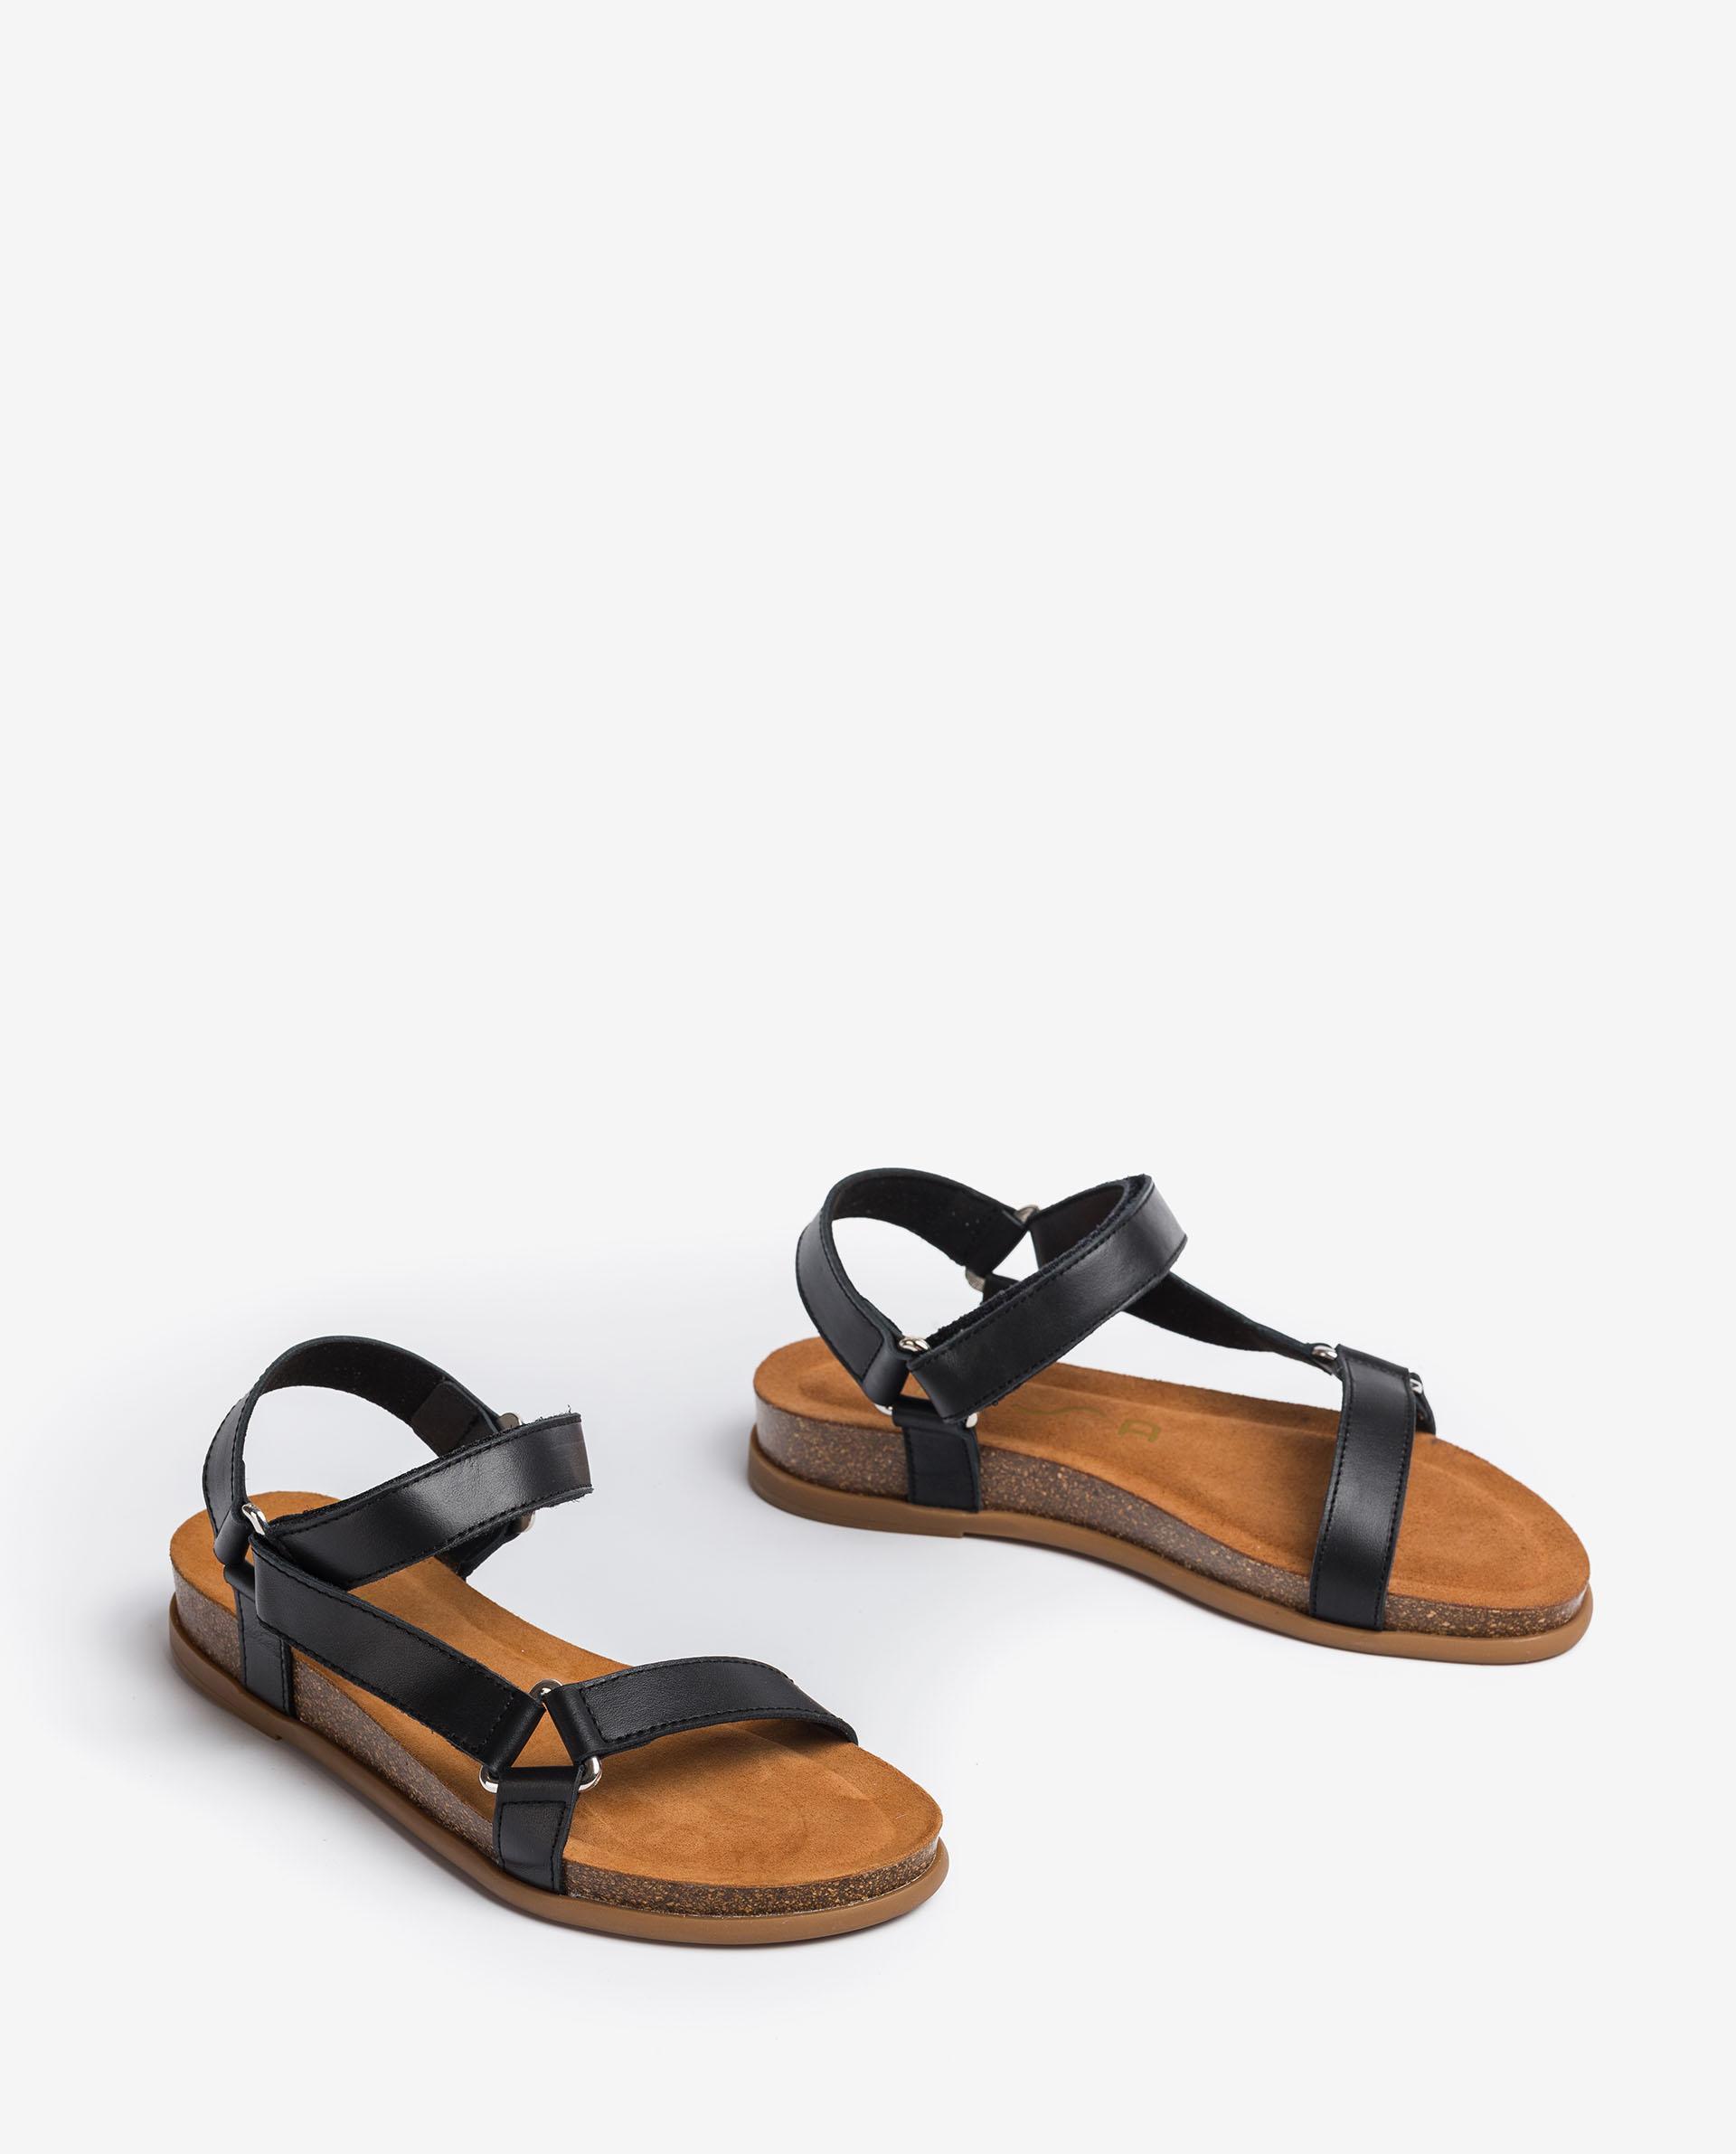 UNISA Leather sandals embellished with metallic triangle COLIRO_RAN 2